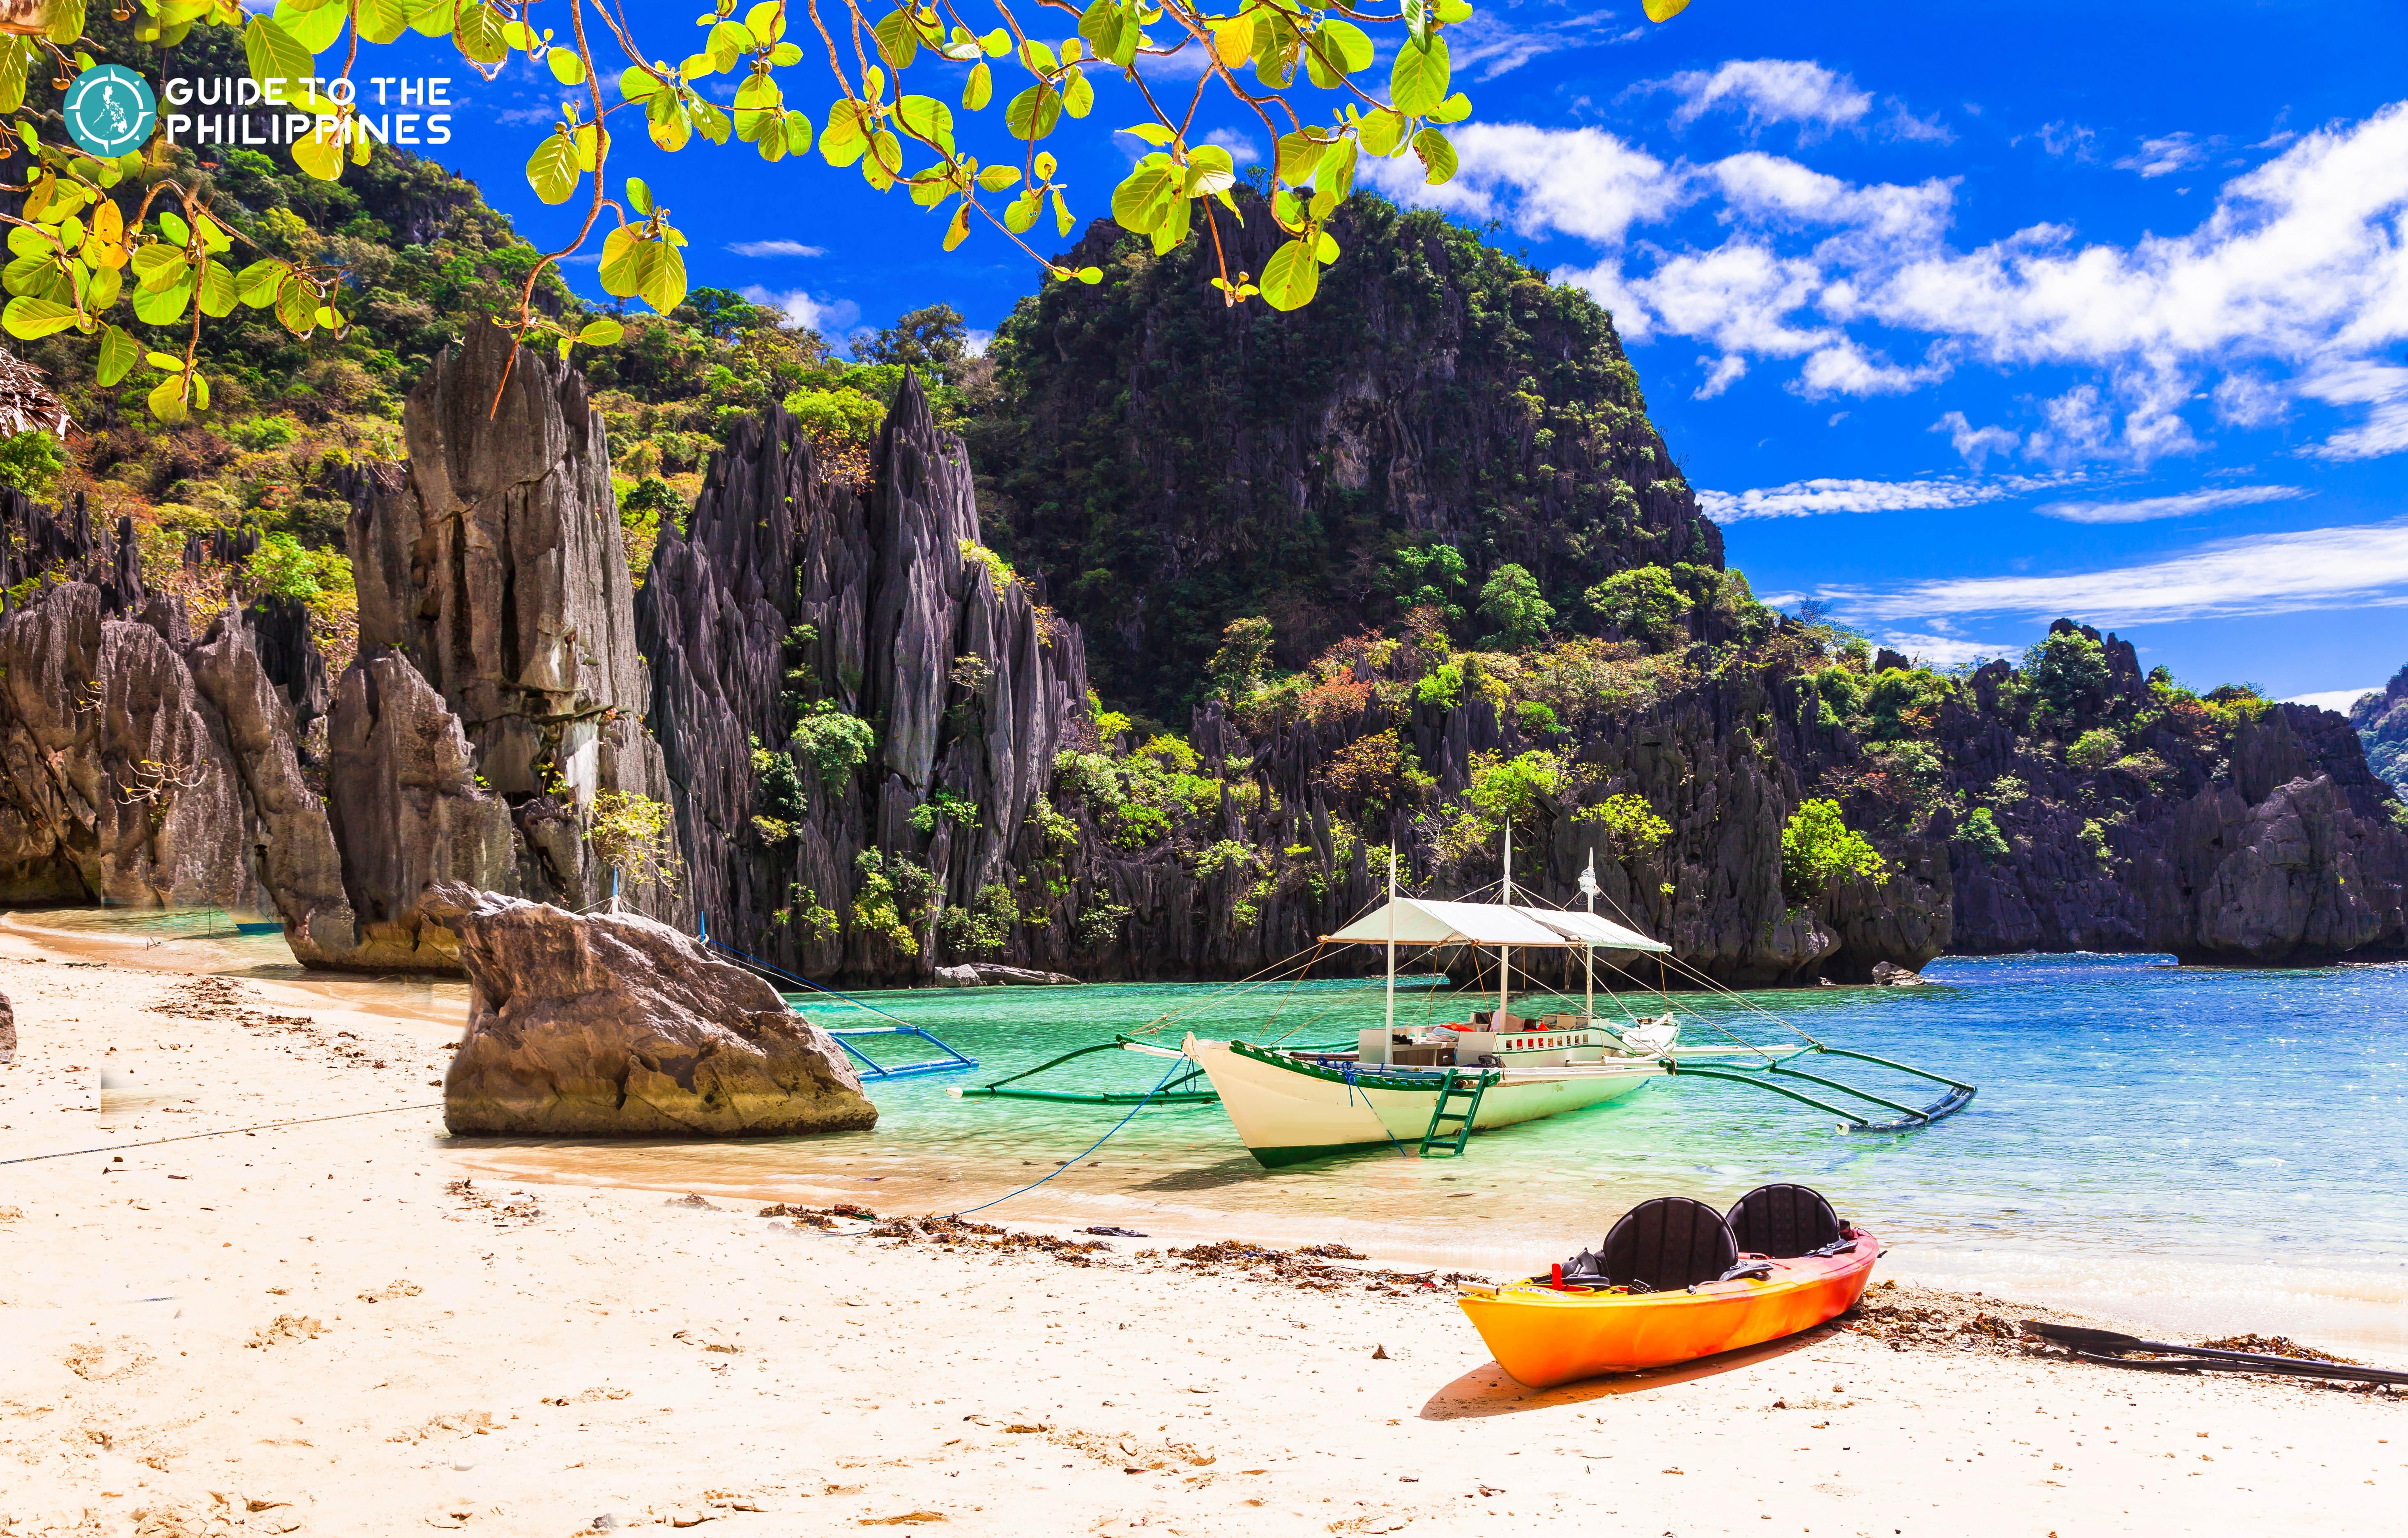 Best Palawan Guide: Travel to El Nido, Coron, Puerto Princesa